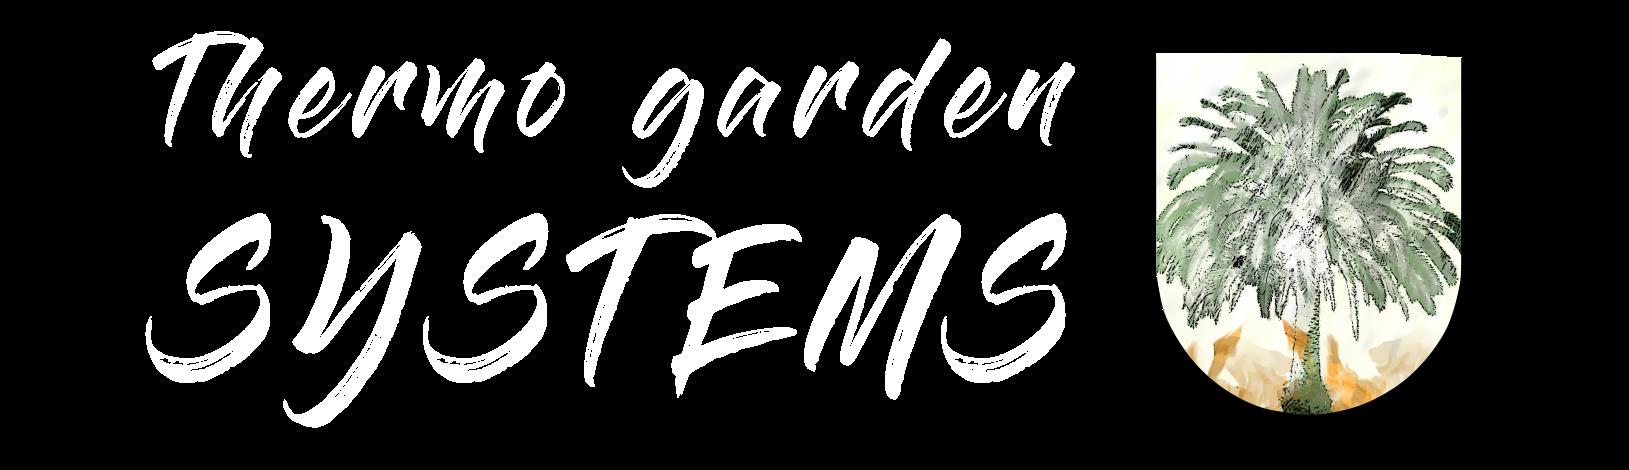 THERMO GARDEN SYSTEMS